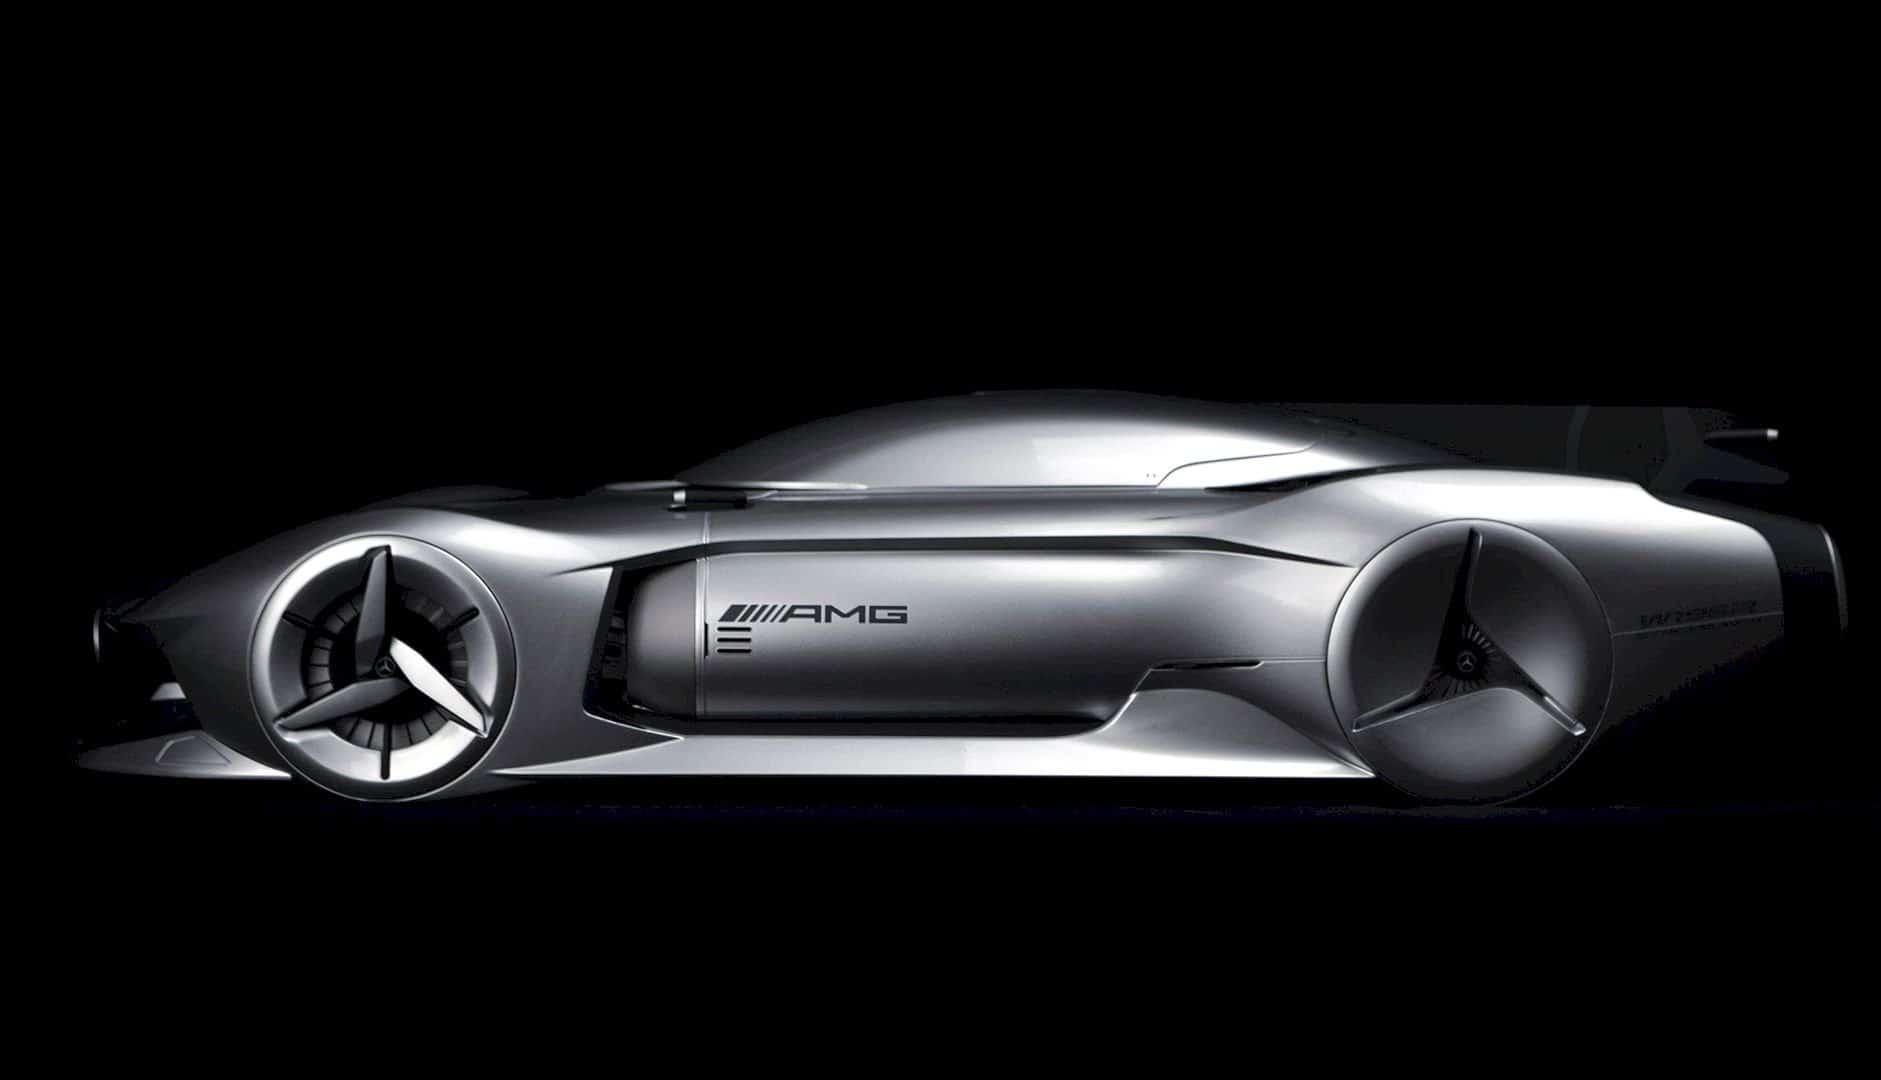 Mercedes-Benz 2040 W196R Streamliner: An Automotive Design of High-Speed GT Cars